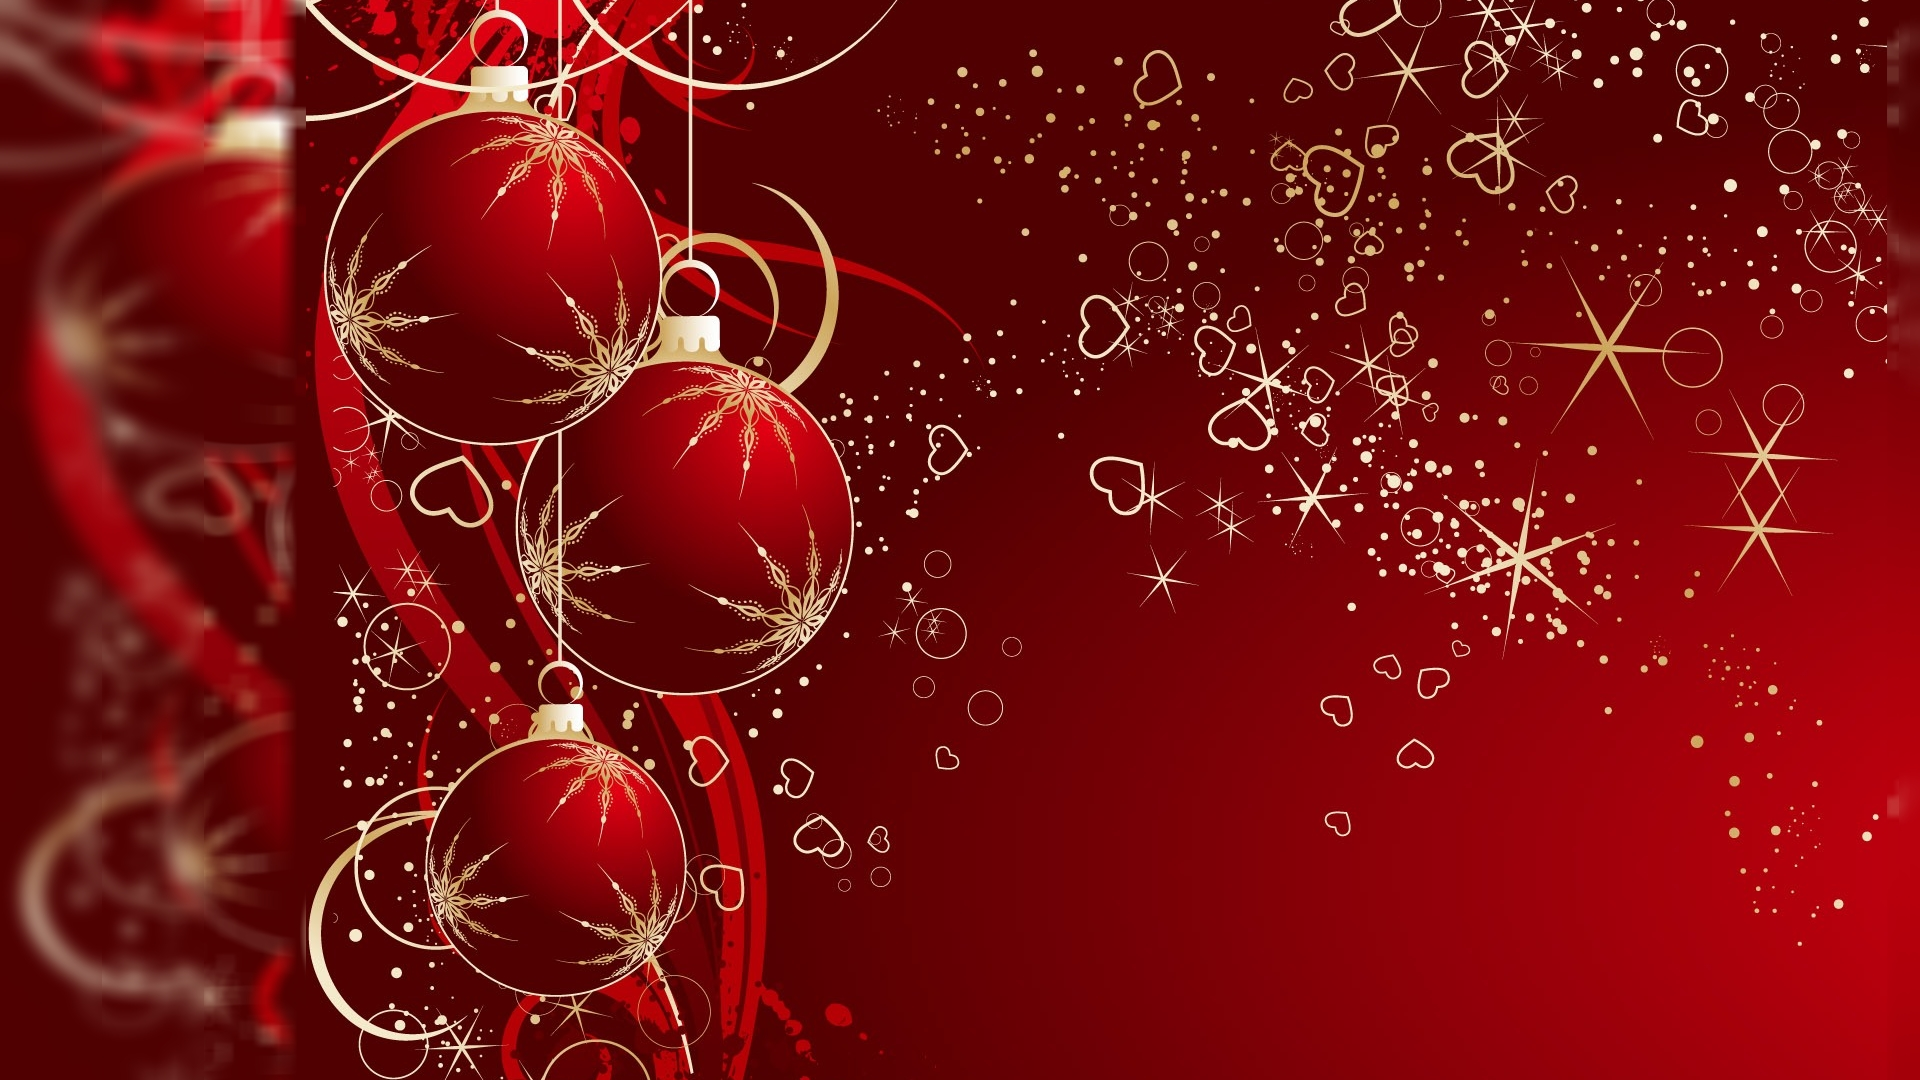 Christmas Desktop Backgrounds Graphics   wwwwallpapers in hdcom 1920x1080